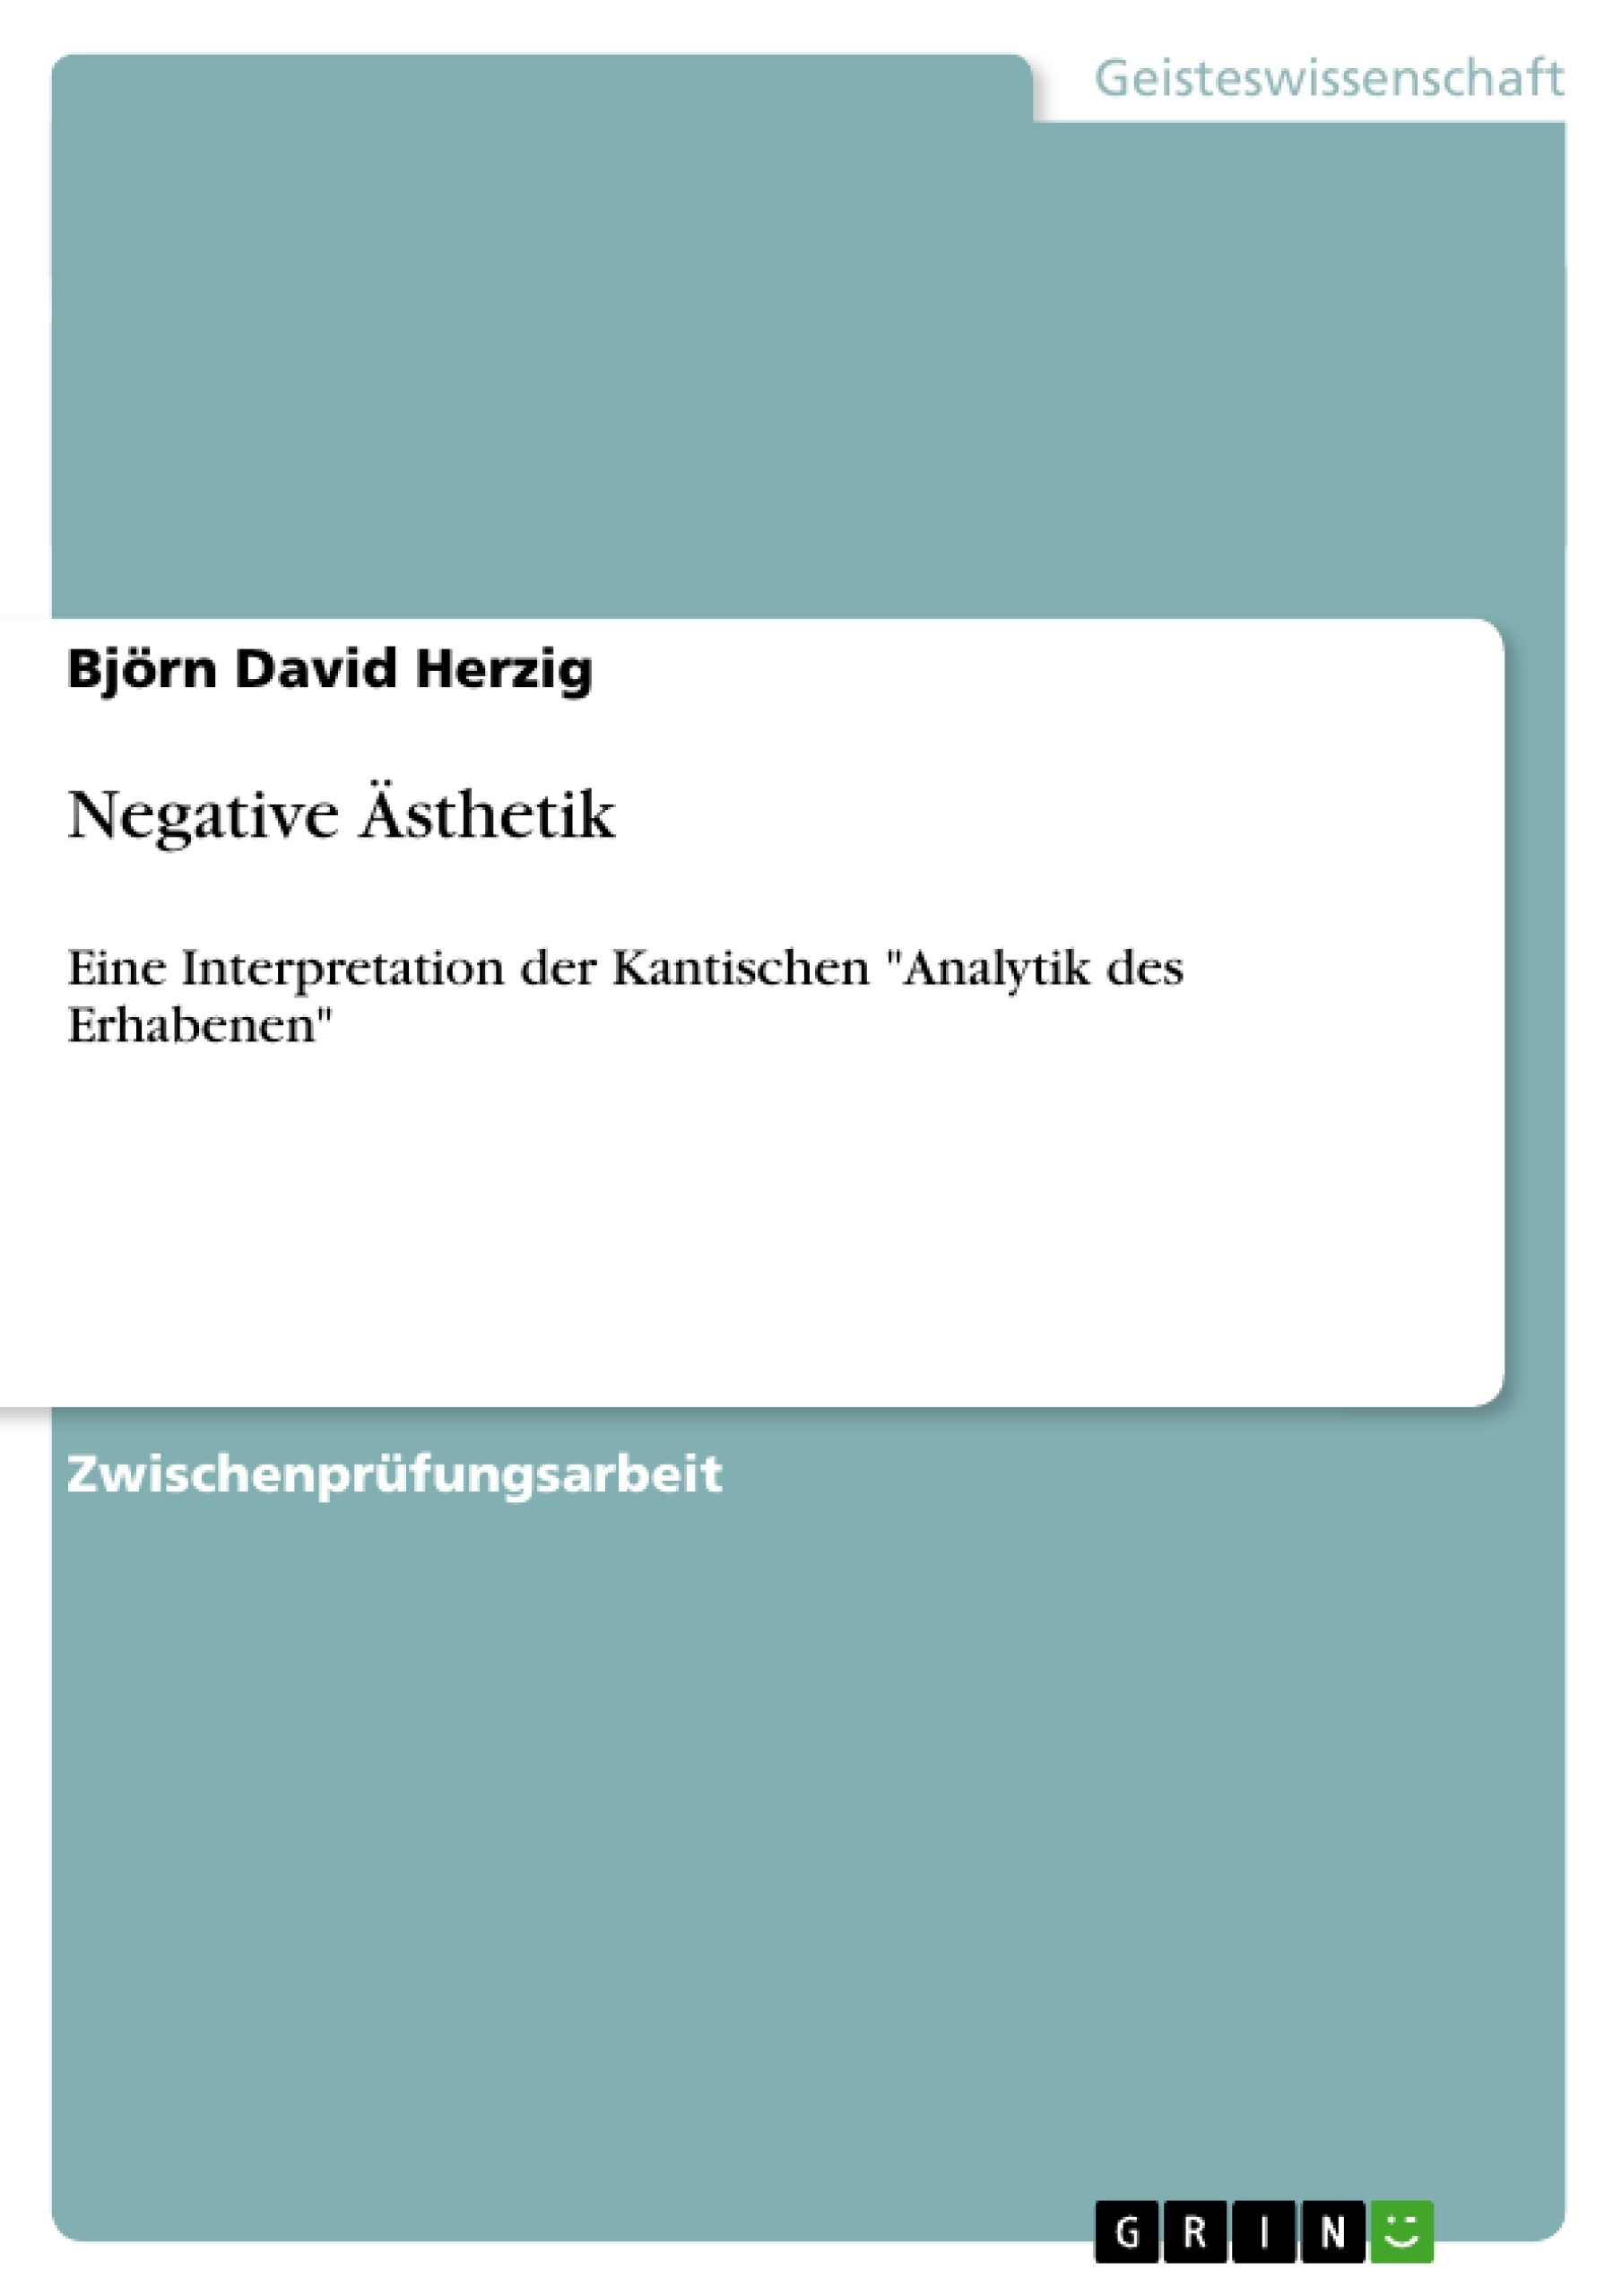 Titel: Negative Ästhetik